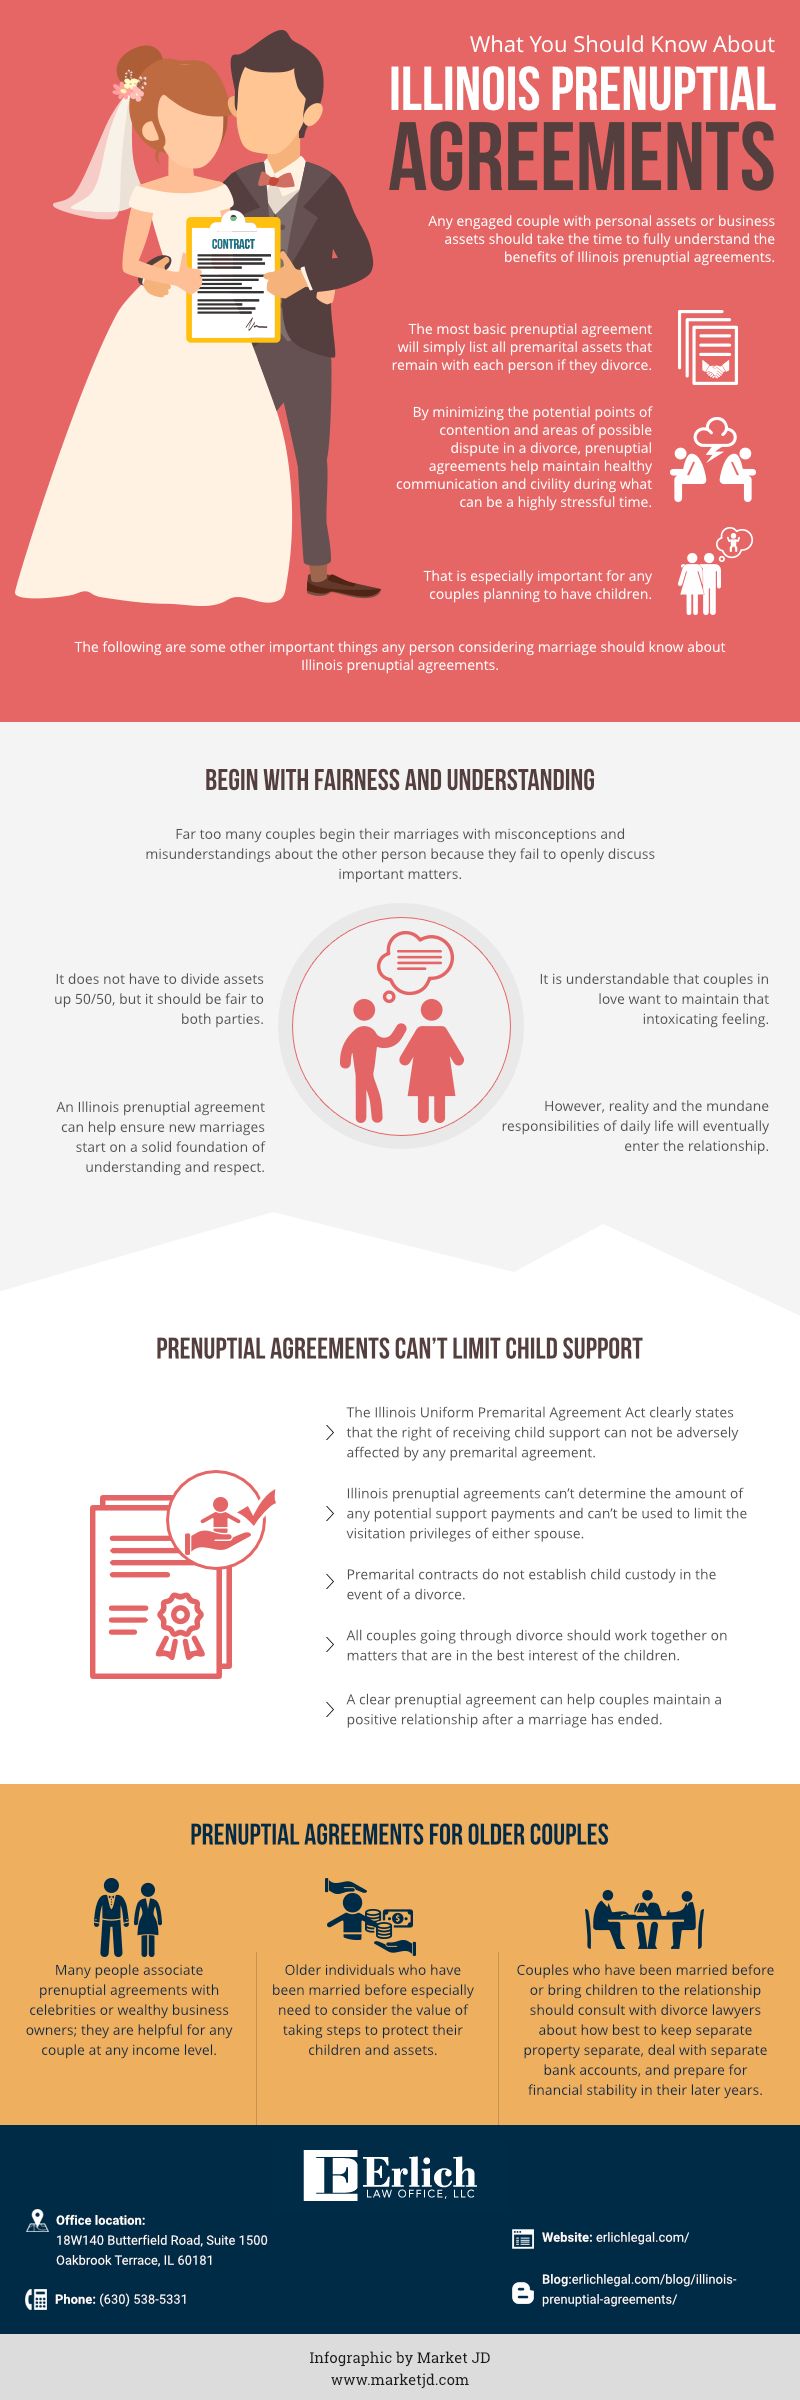 infographic_Illinois Prenuptial Agreements